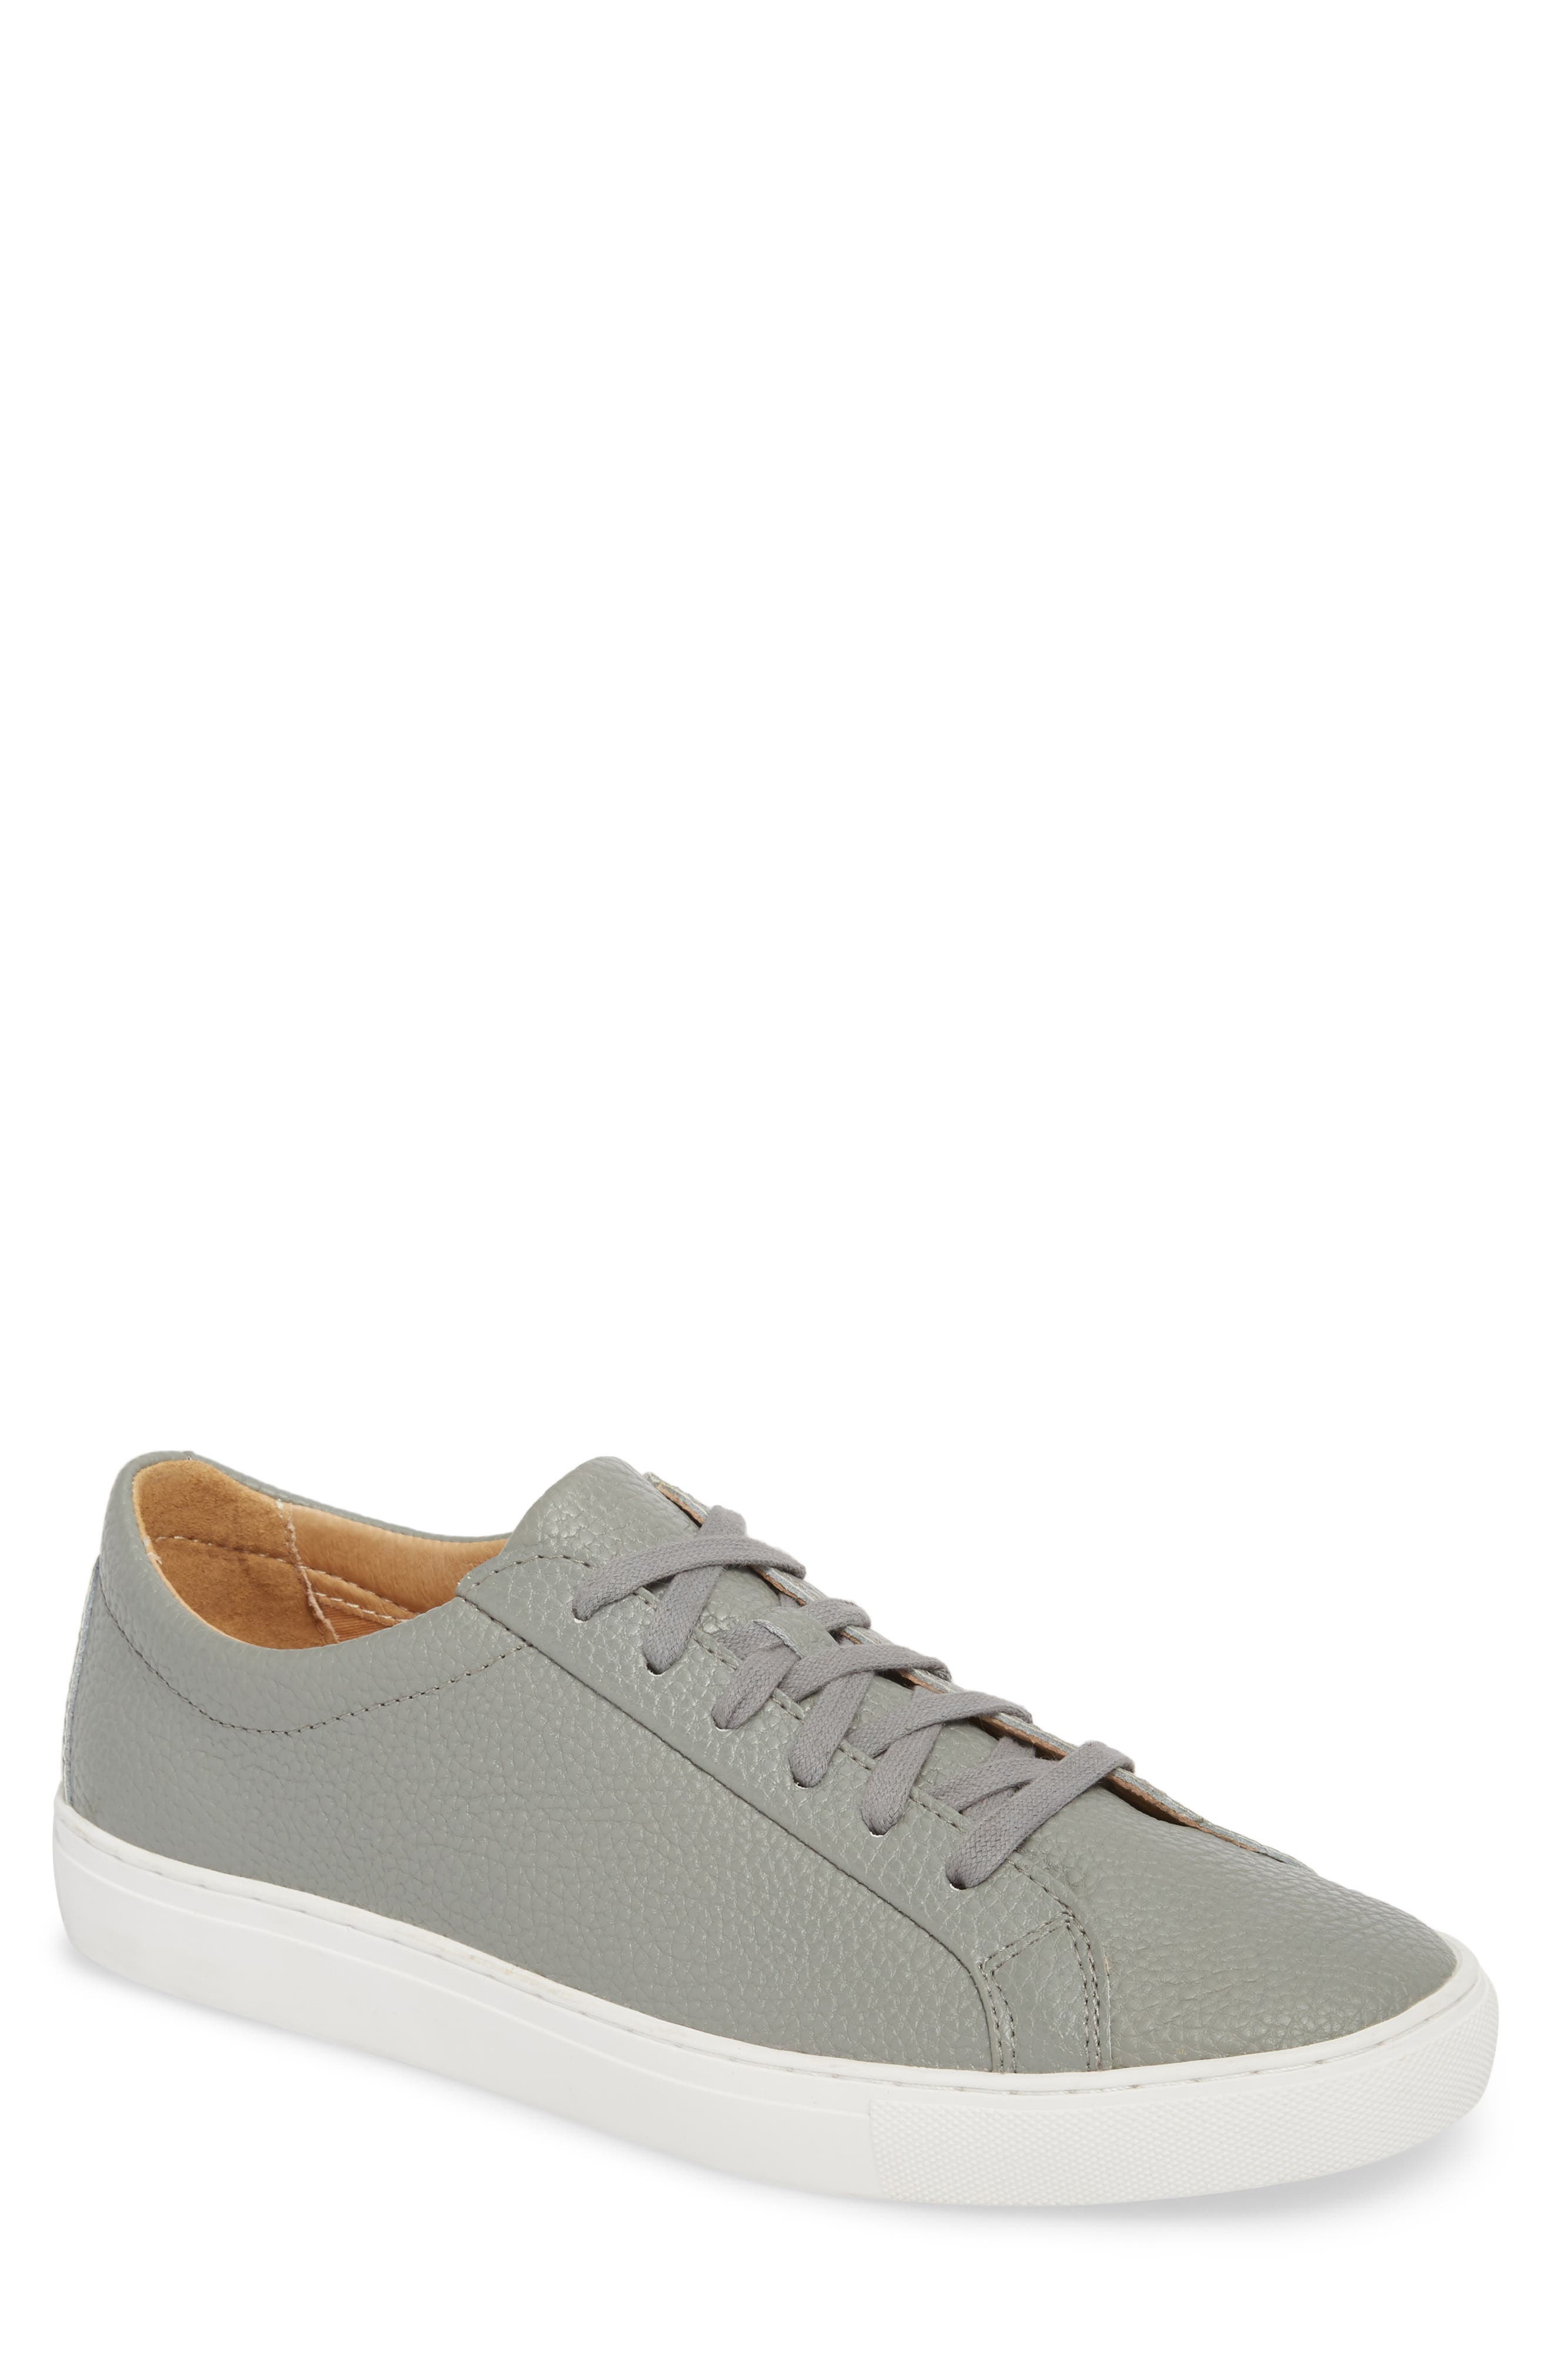 3c16e195782 Men s TCG Shoes